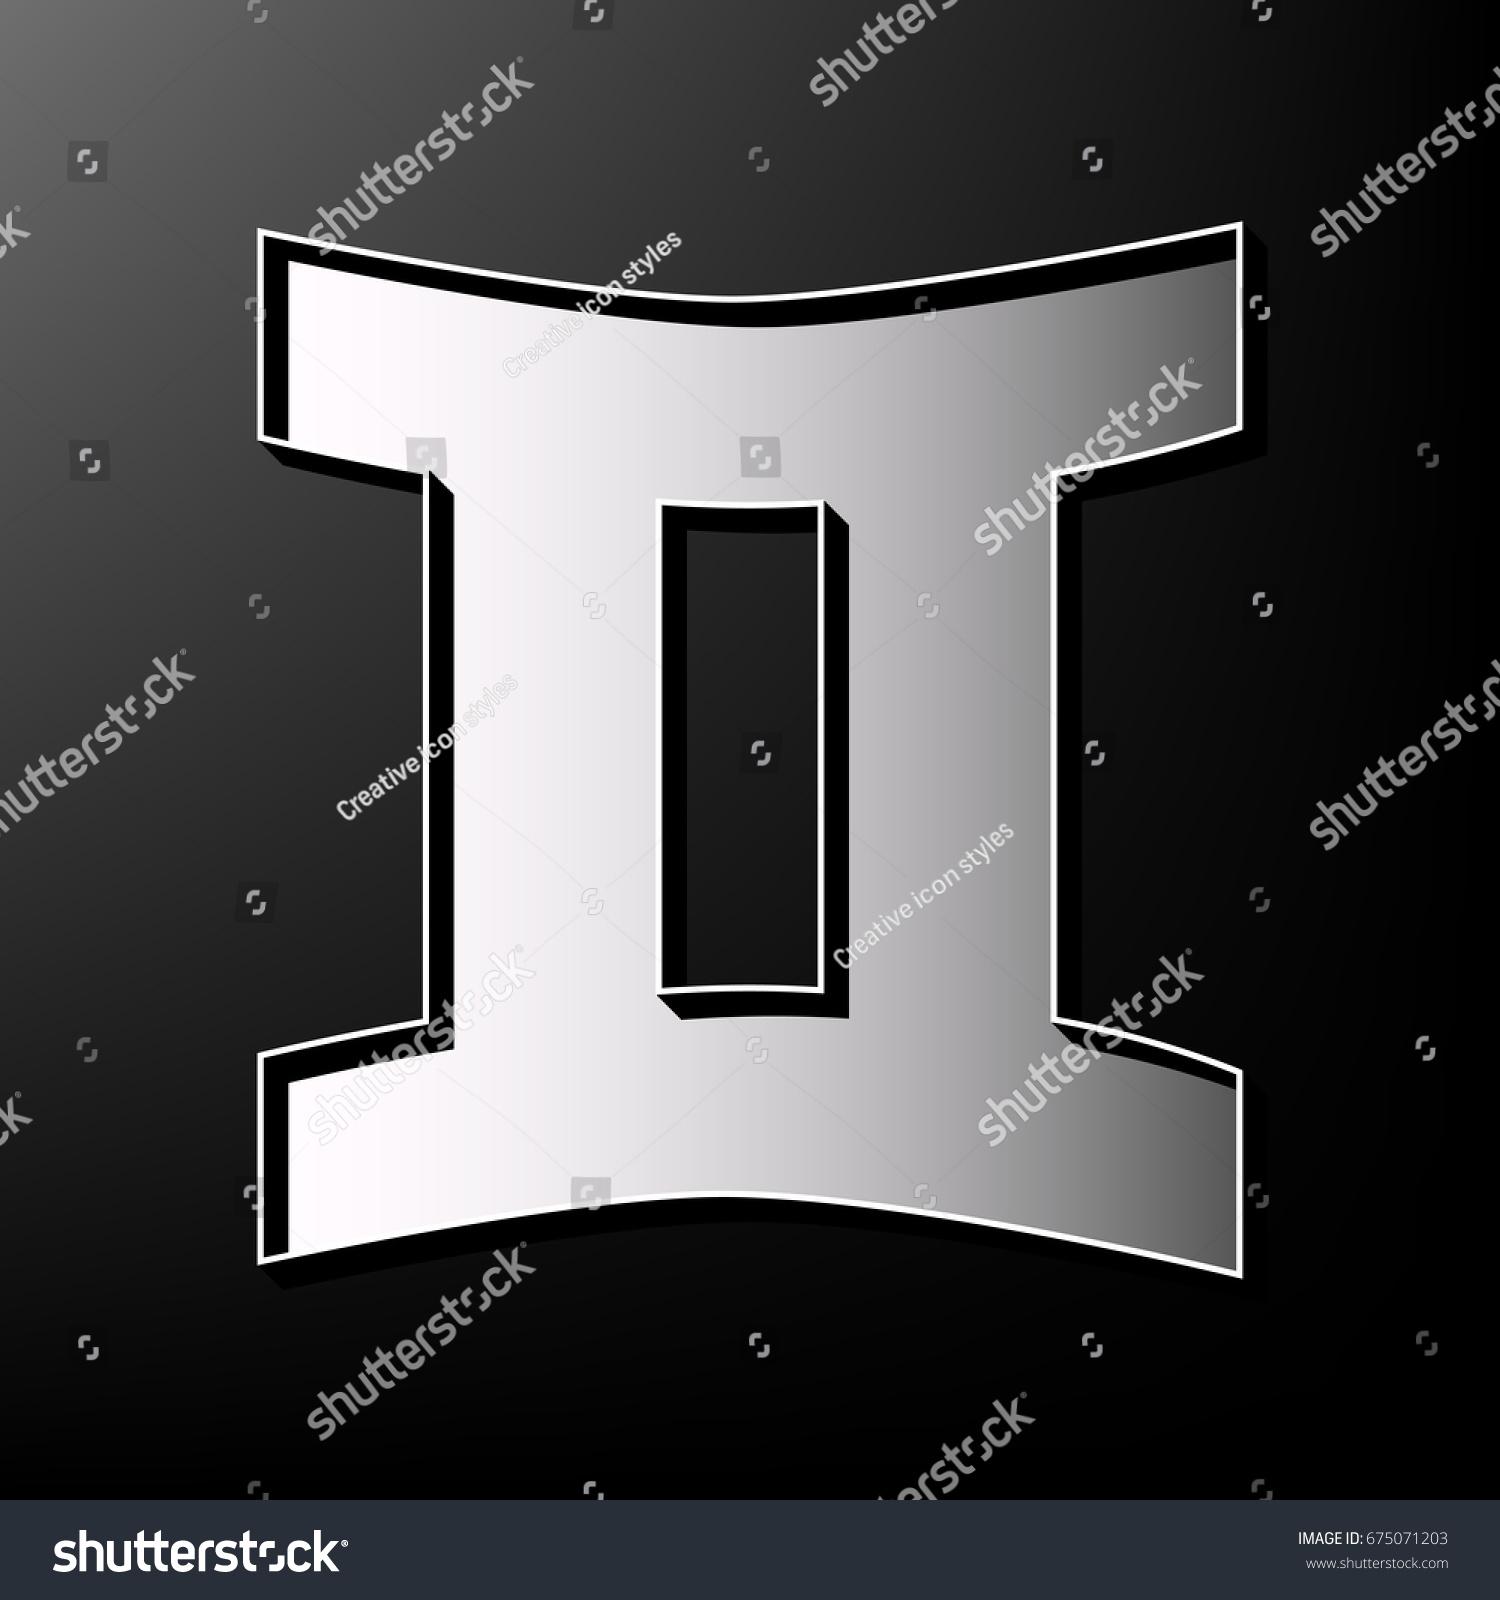 Gemini sign vector gray 3d printed stock vector 675071203 gemini sign vector gray 3d printed icon on black background buycottarizona